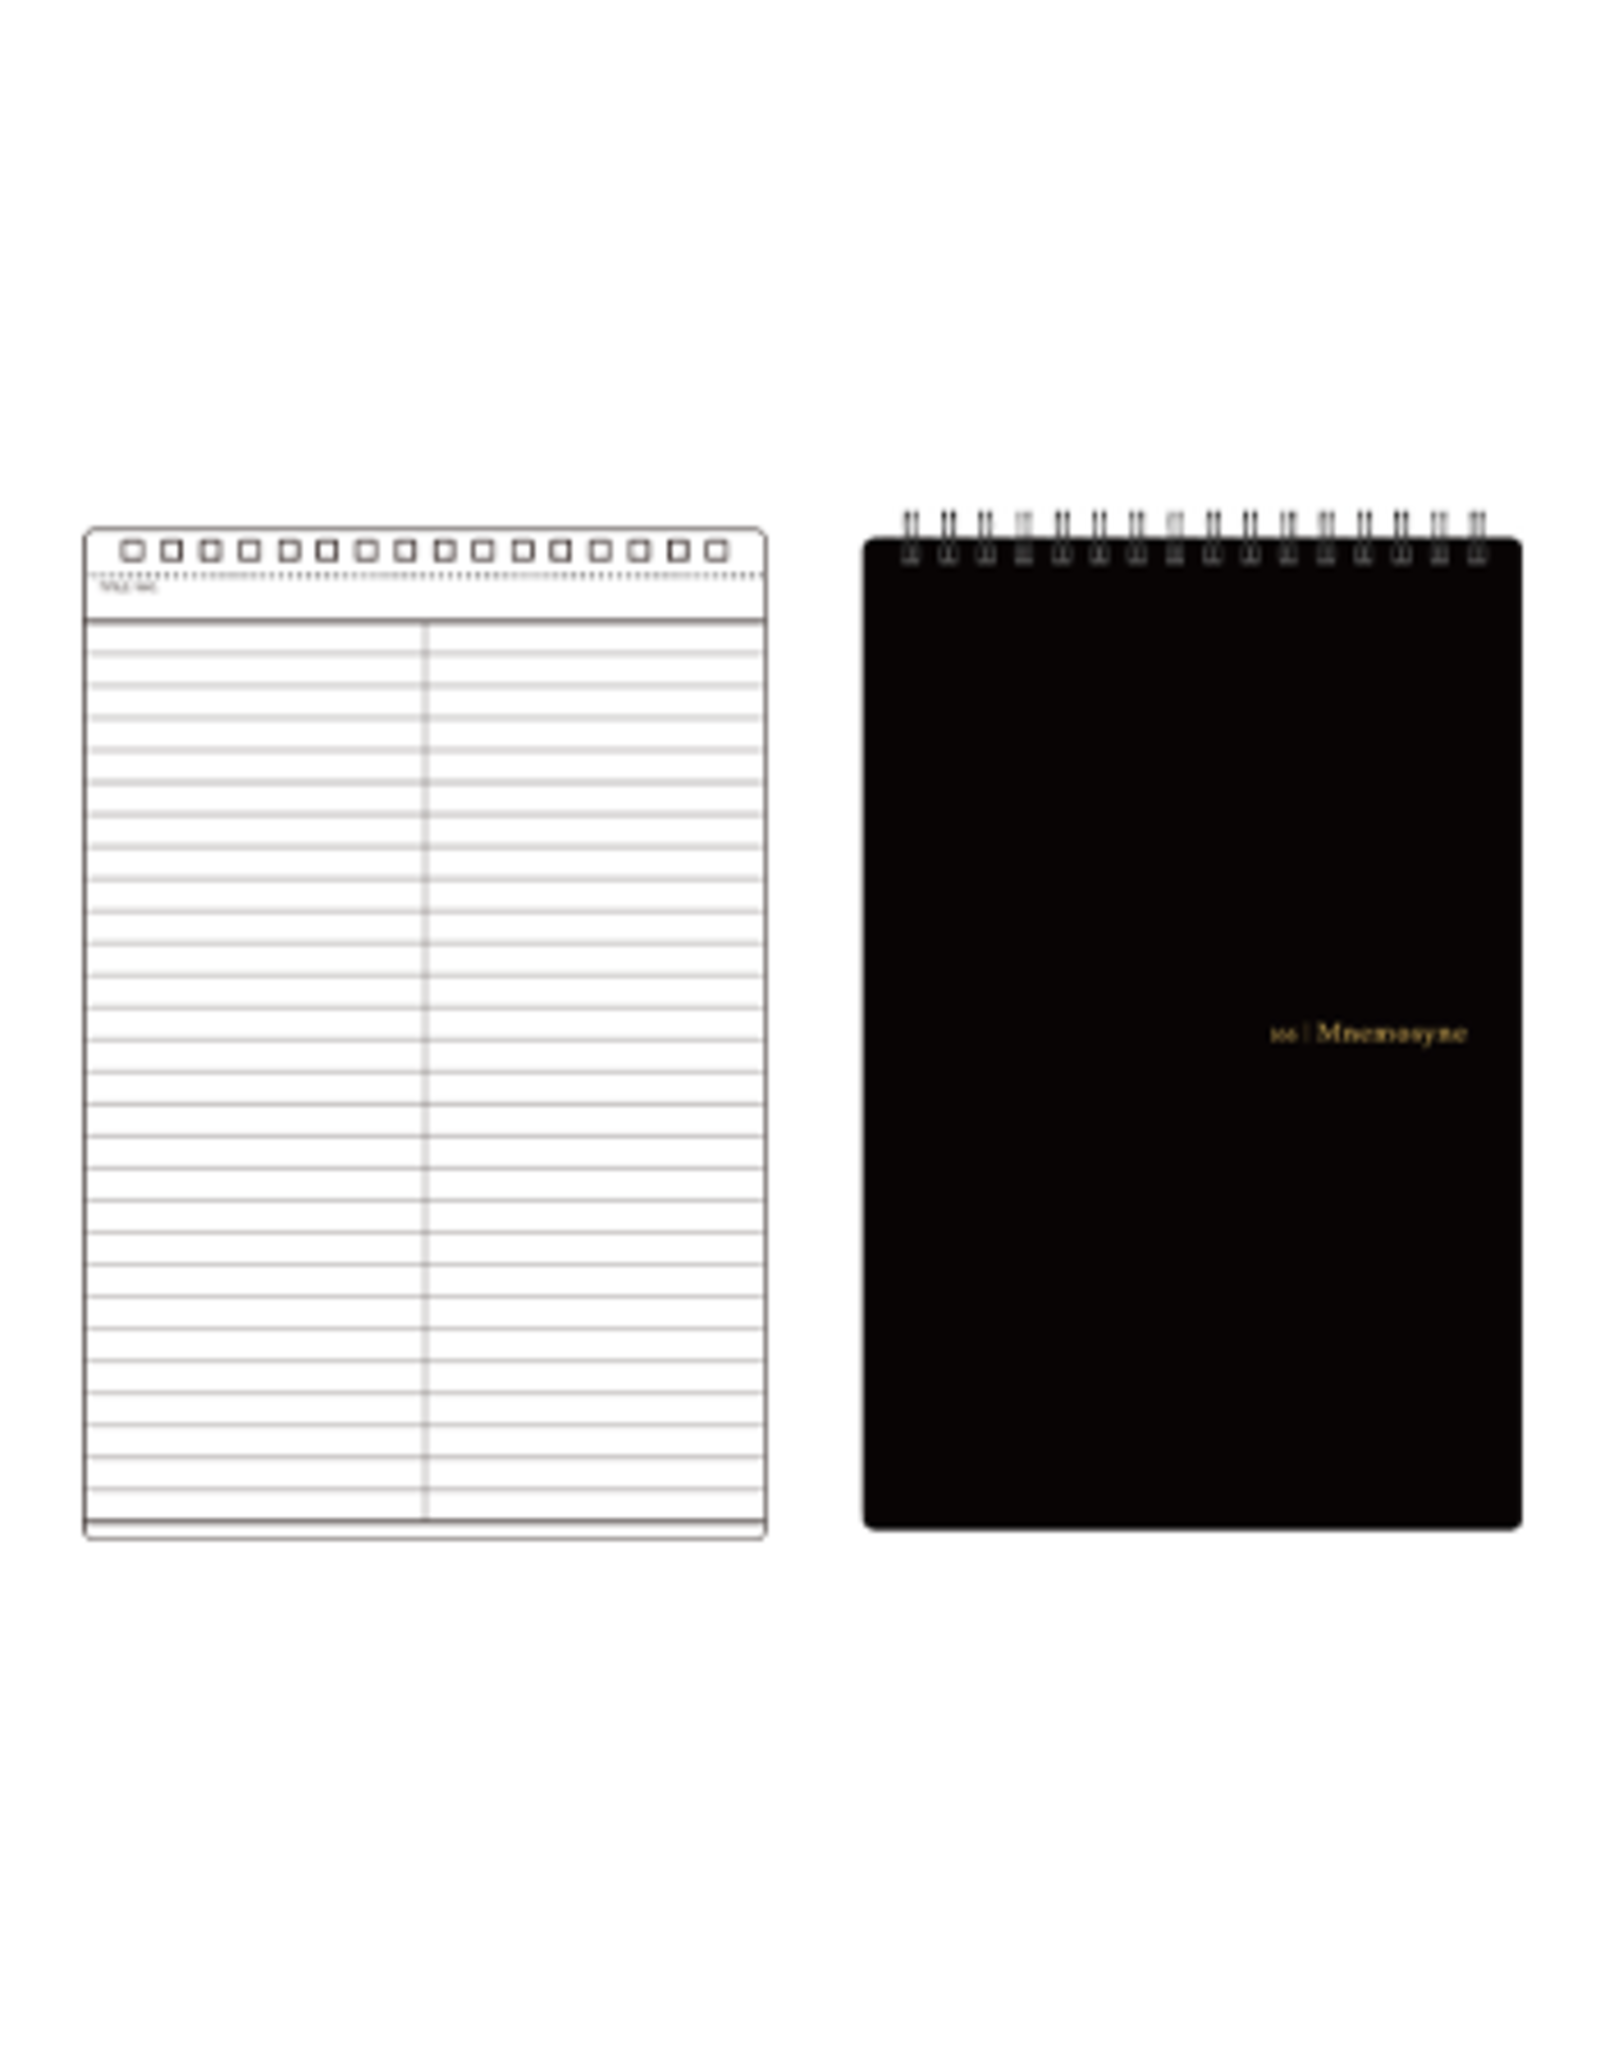 MARUMAN N166 MNEMOSYNE NOTEBOOK 7MM LINED A5 230X148MM